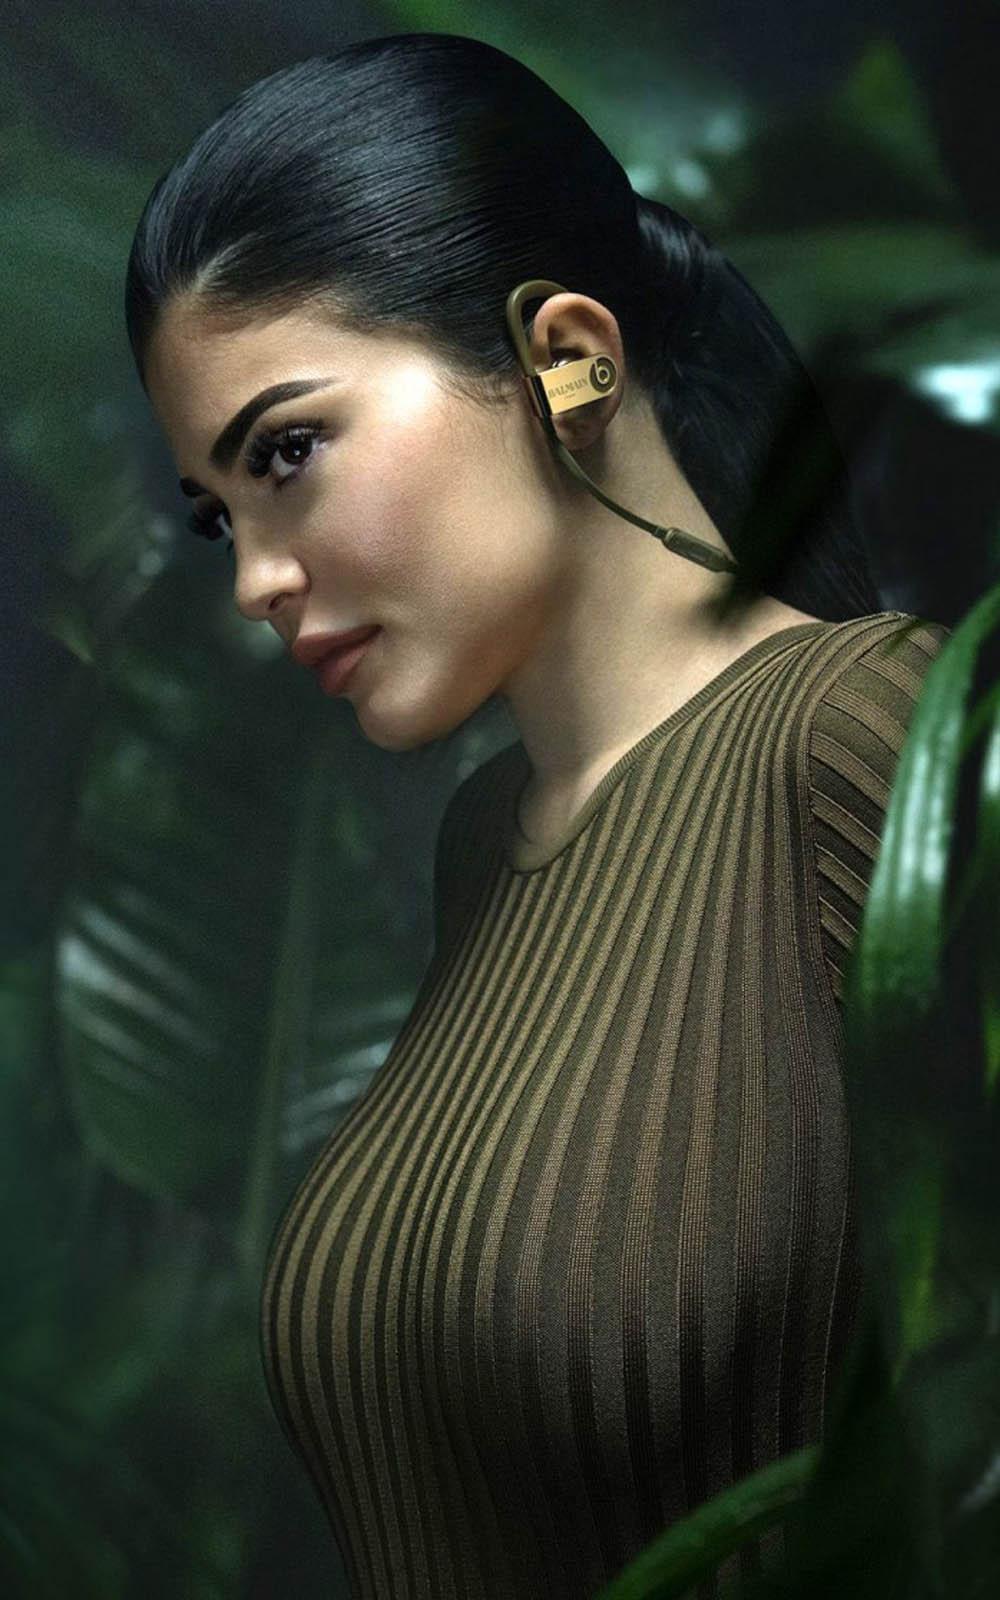 Kylie Jenner In Balmain 2017 4K Ultra HD Mobile Wallpaper